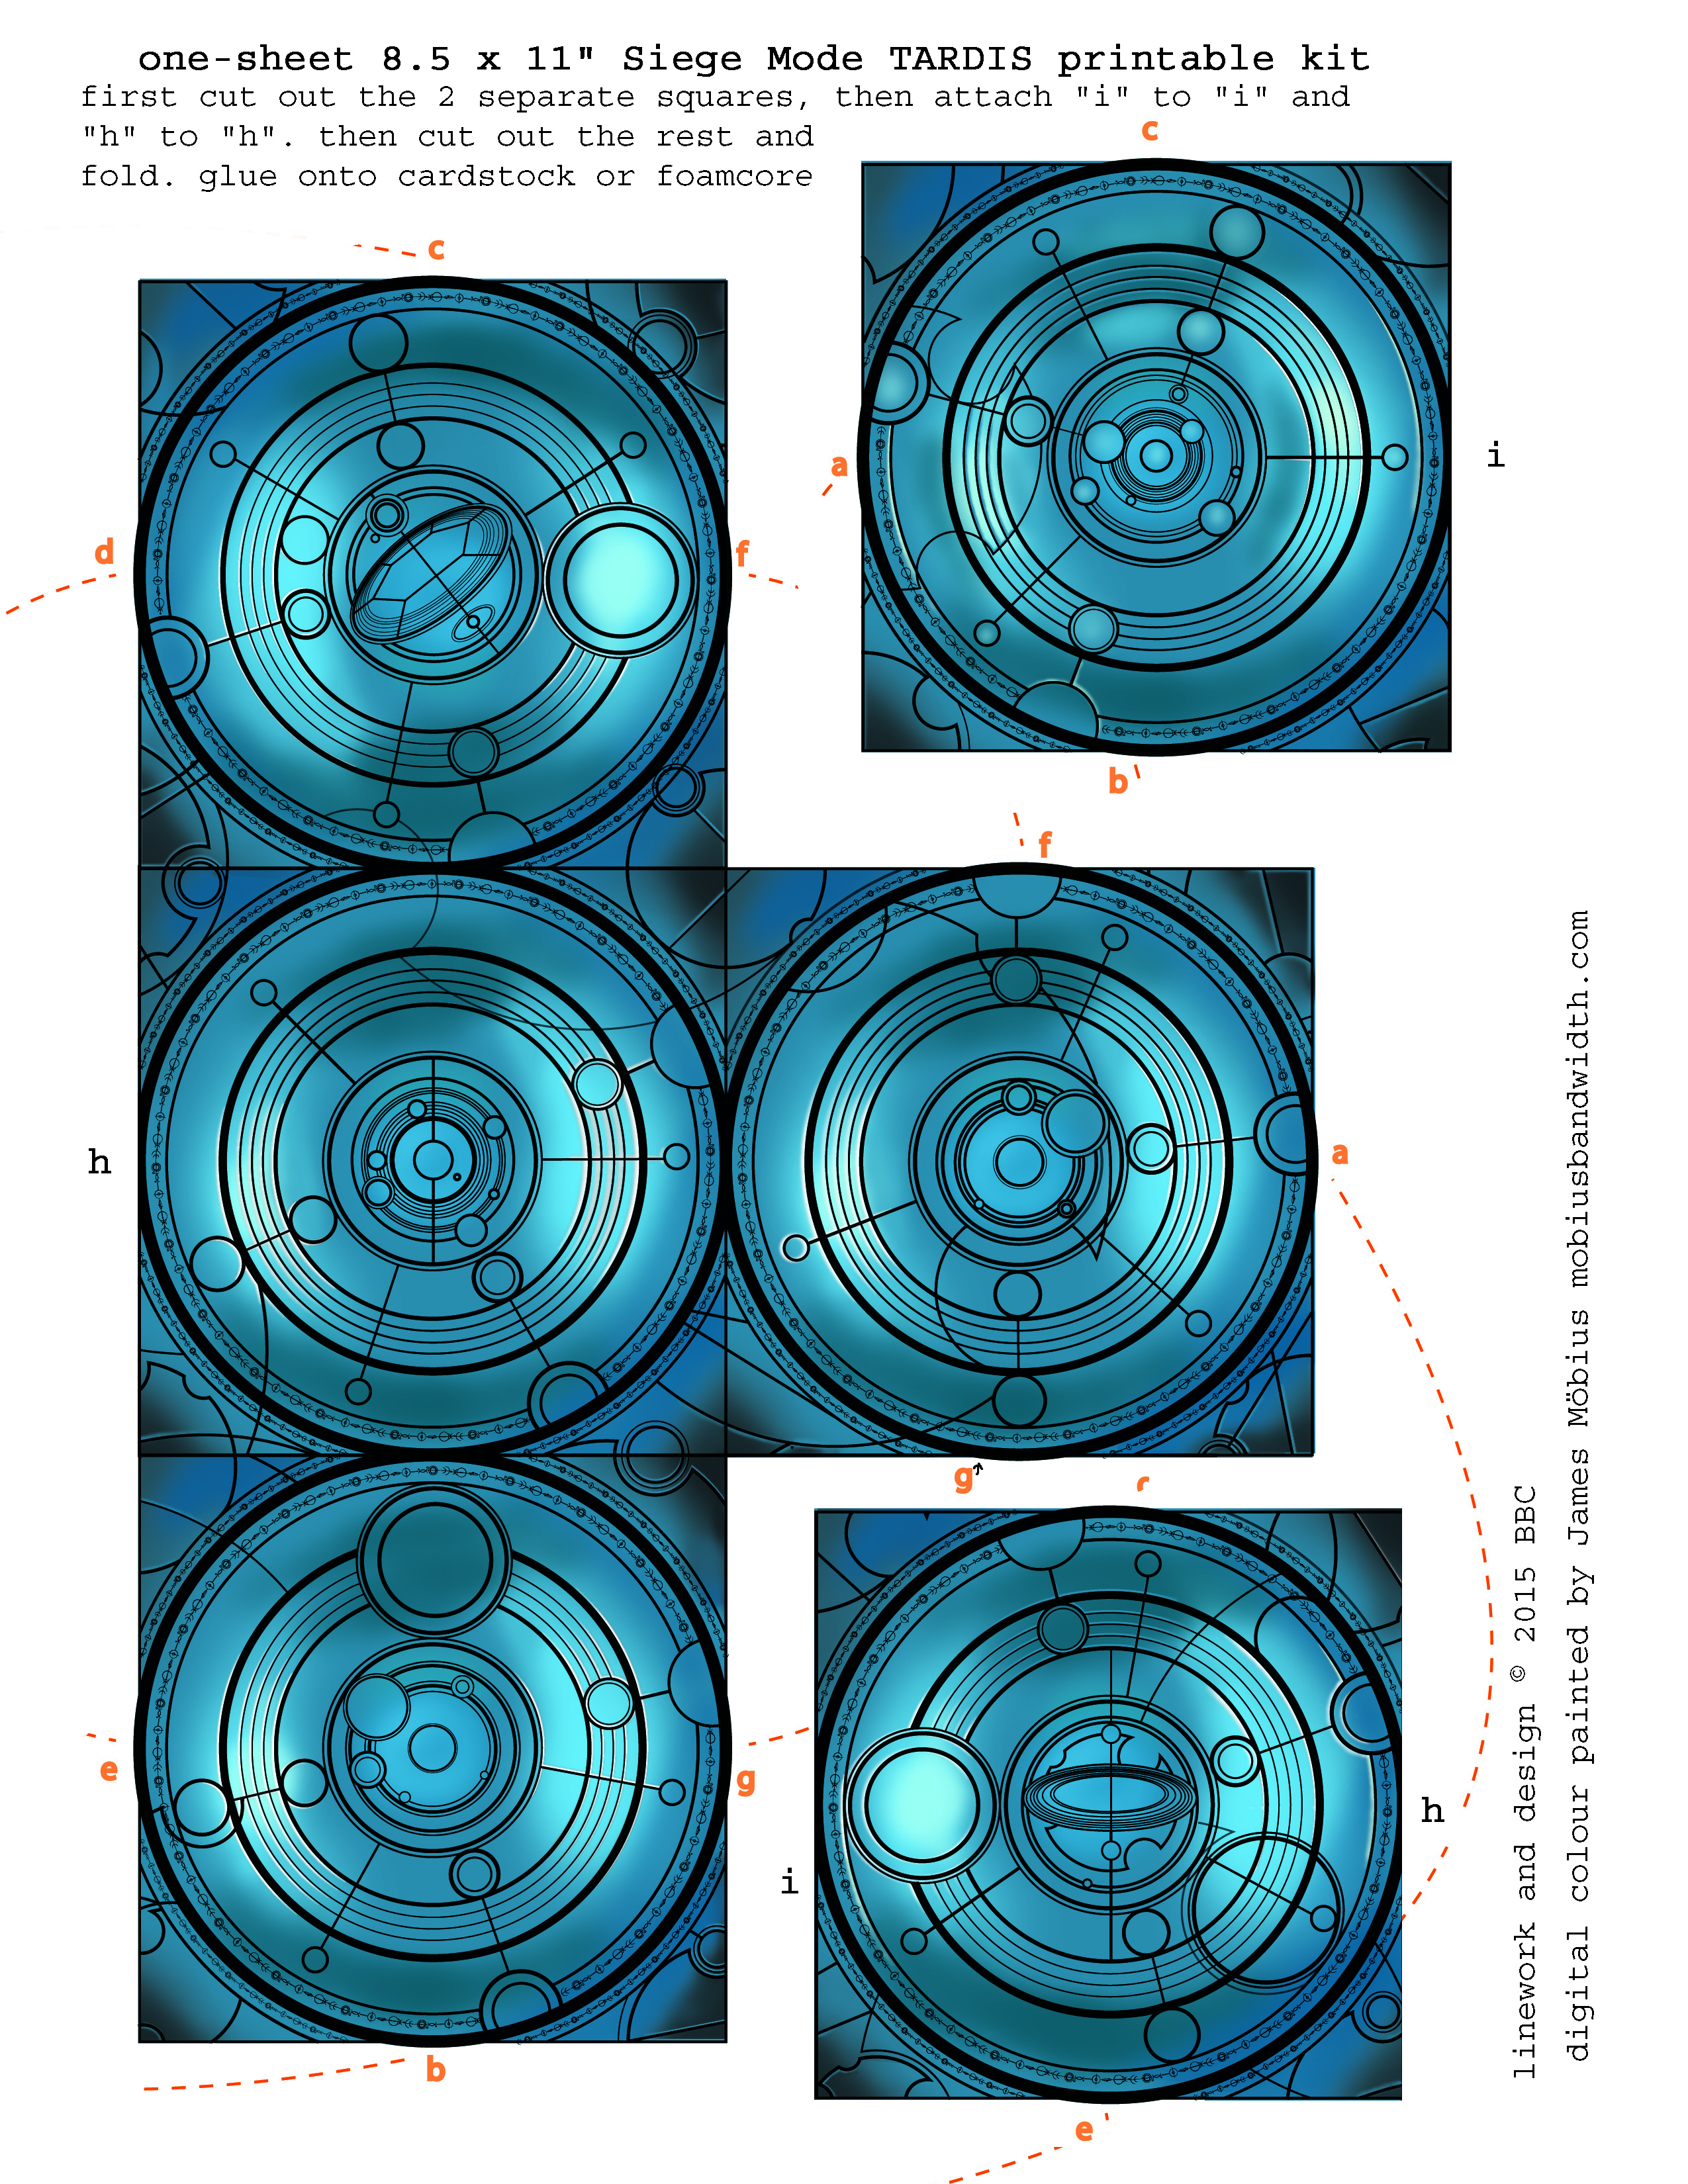 image regarding Tardis Printable referred to as Siege Manner Tardis printable package 8.5 x 11 by way of J-Mobius upon